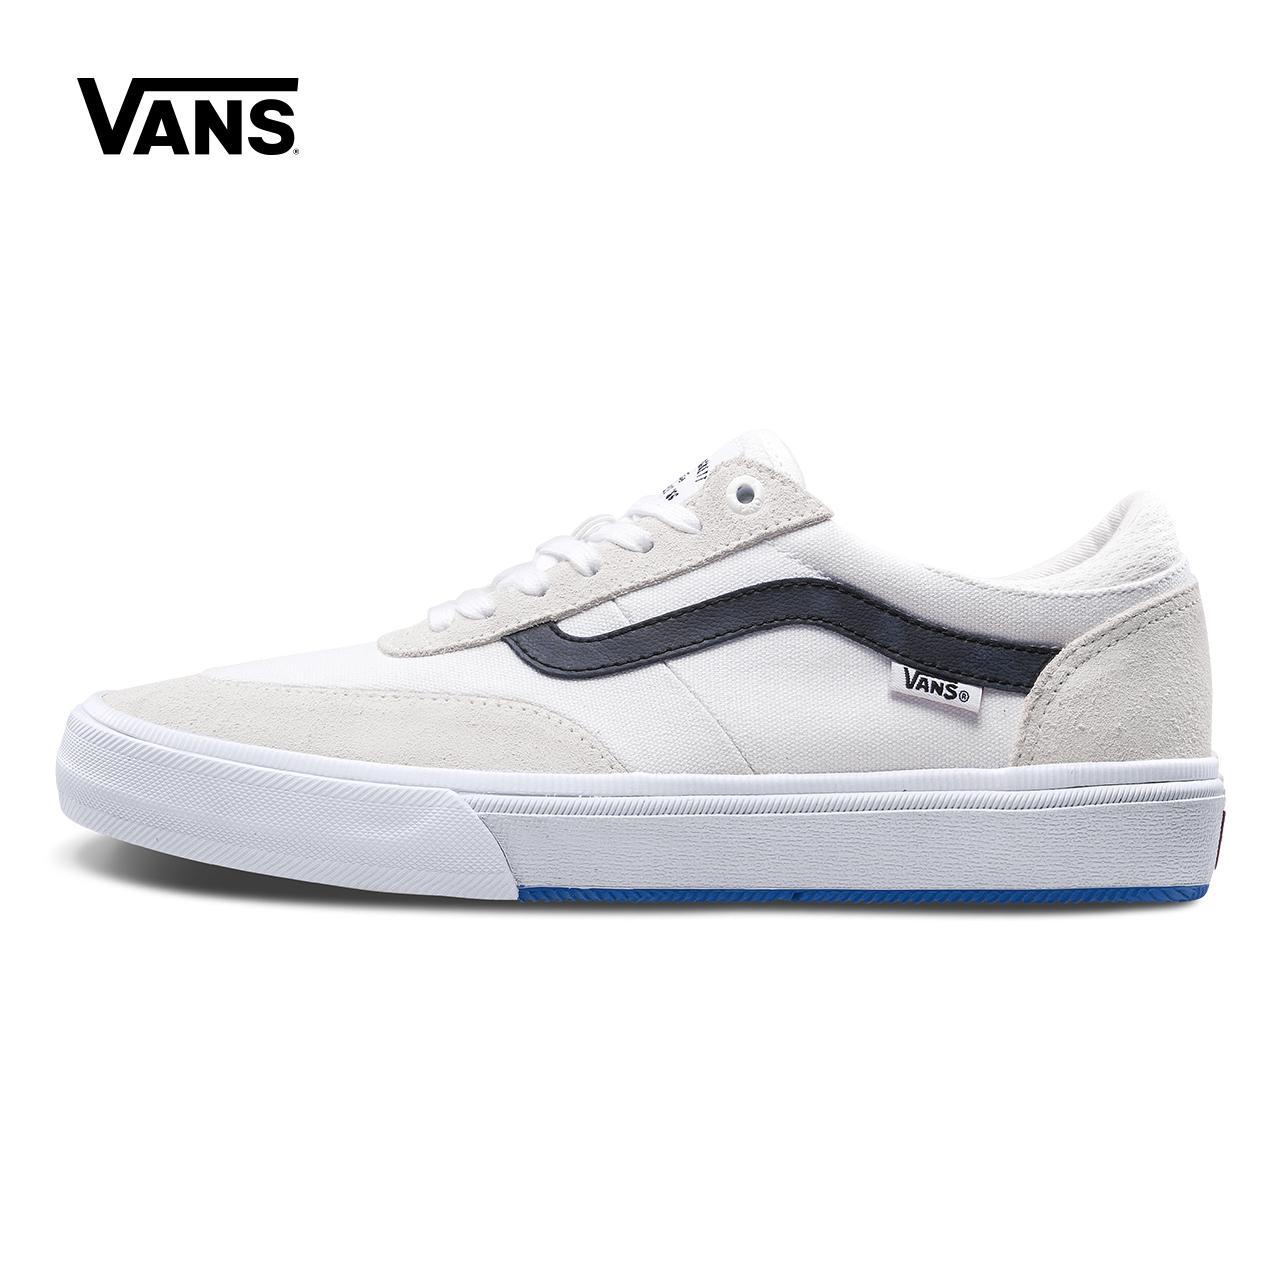 Vans 范斯官方男款侧边条纹滑板鞋|VN0A38COTWB